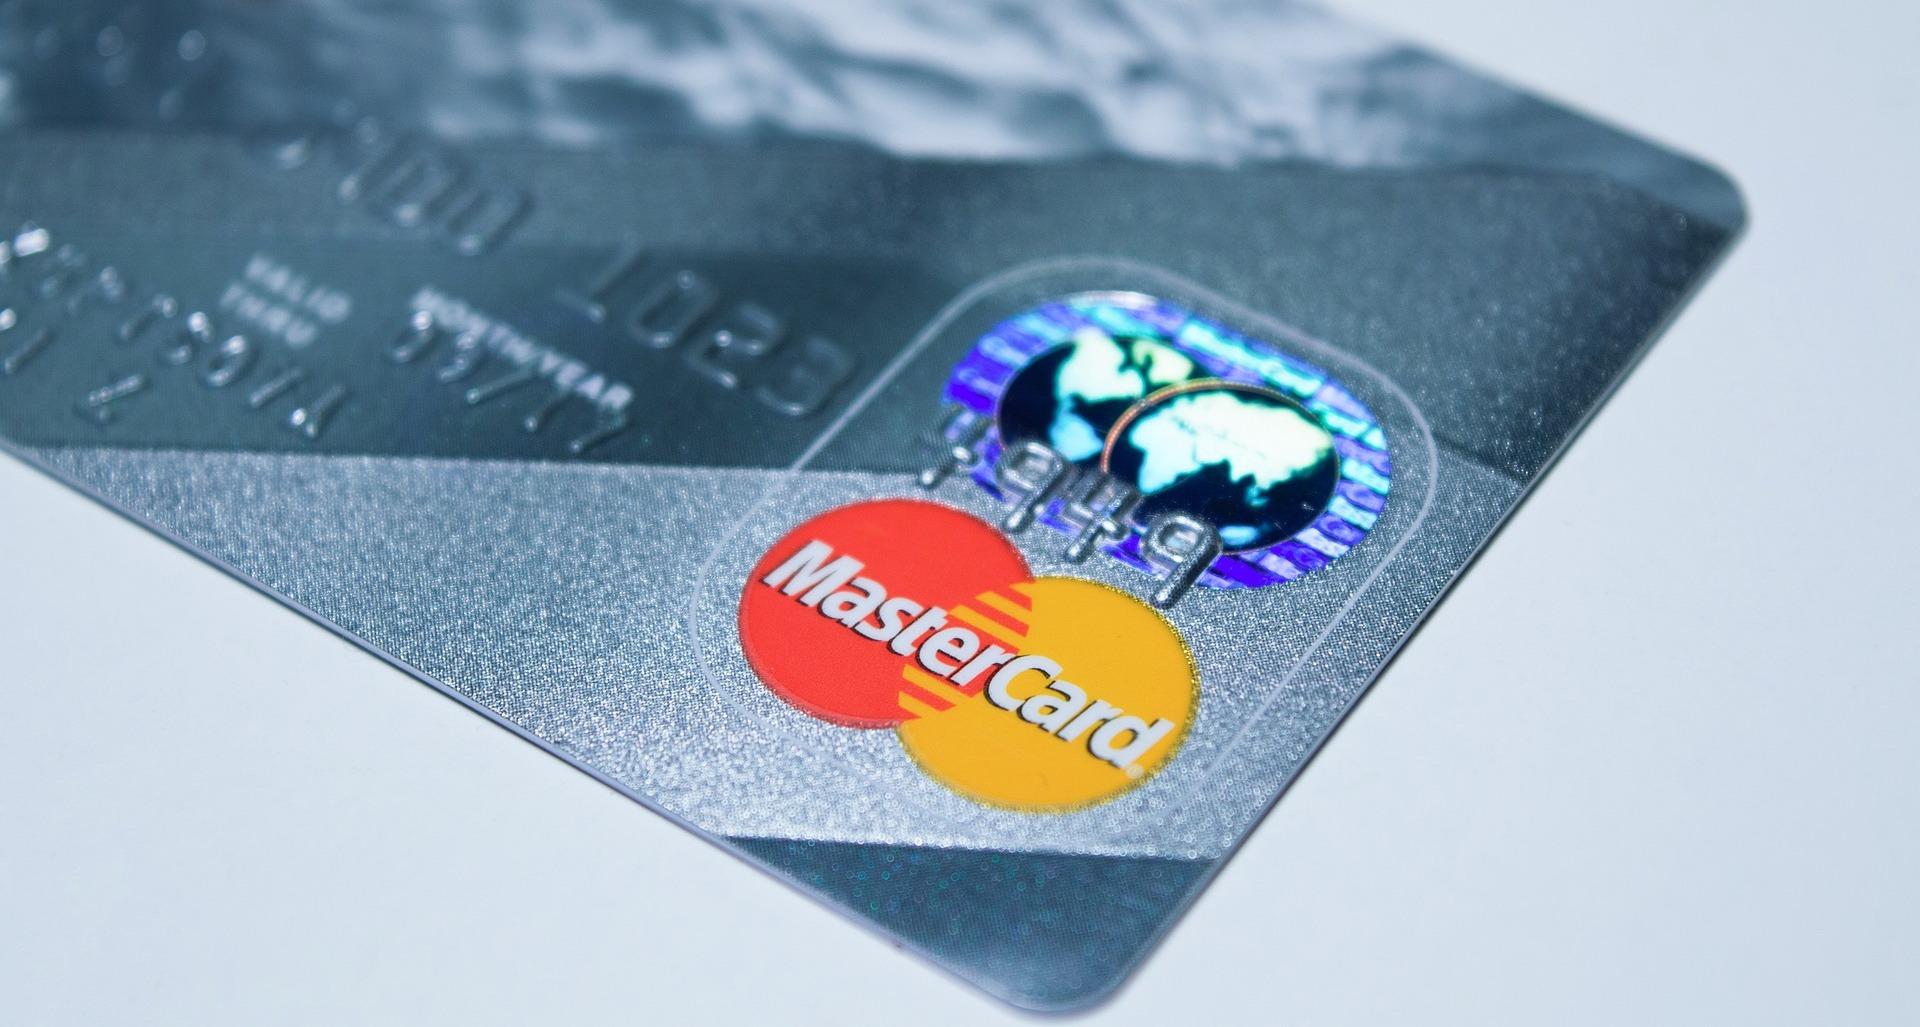 Norisbank Mastercard Kreditkarte